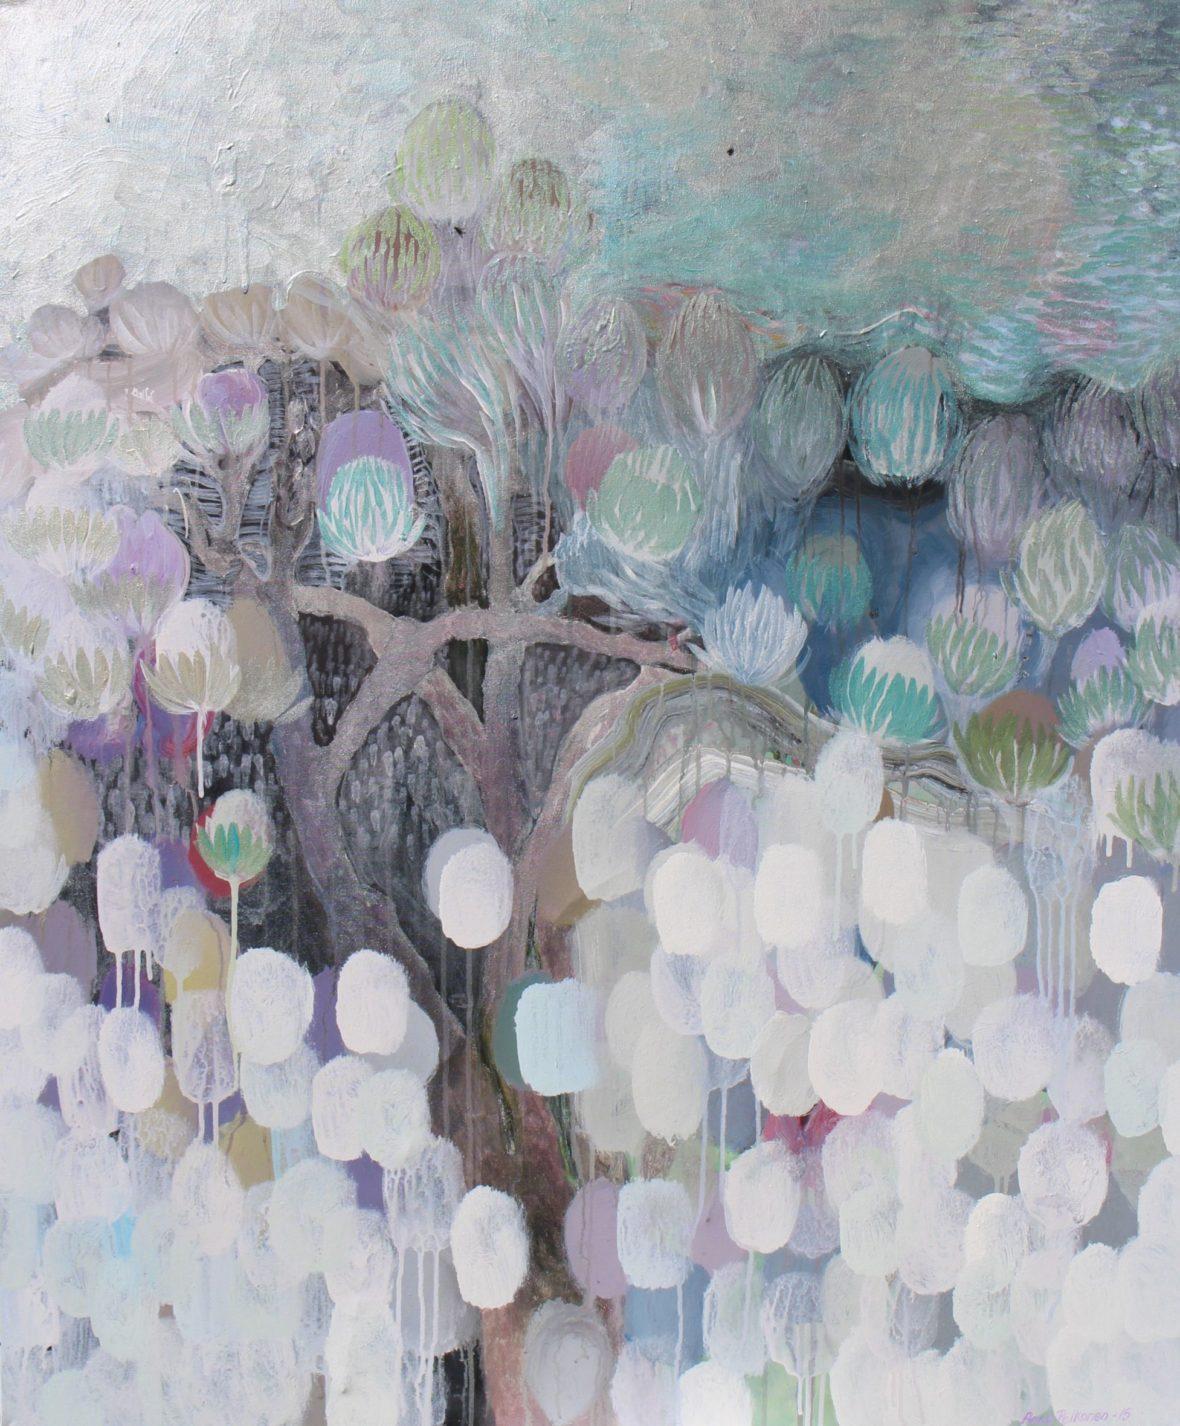 Sarjasta Kaunismaailma 27., akryylimaalaus,  120×100 cm, 2015